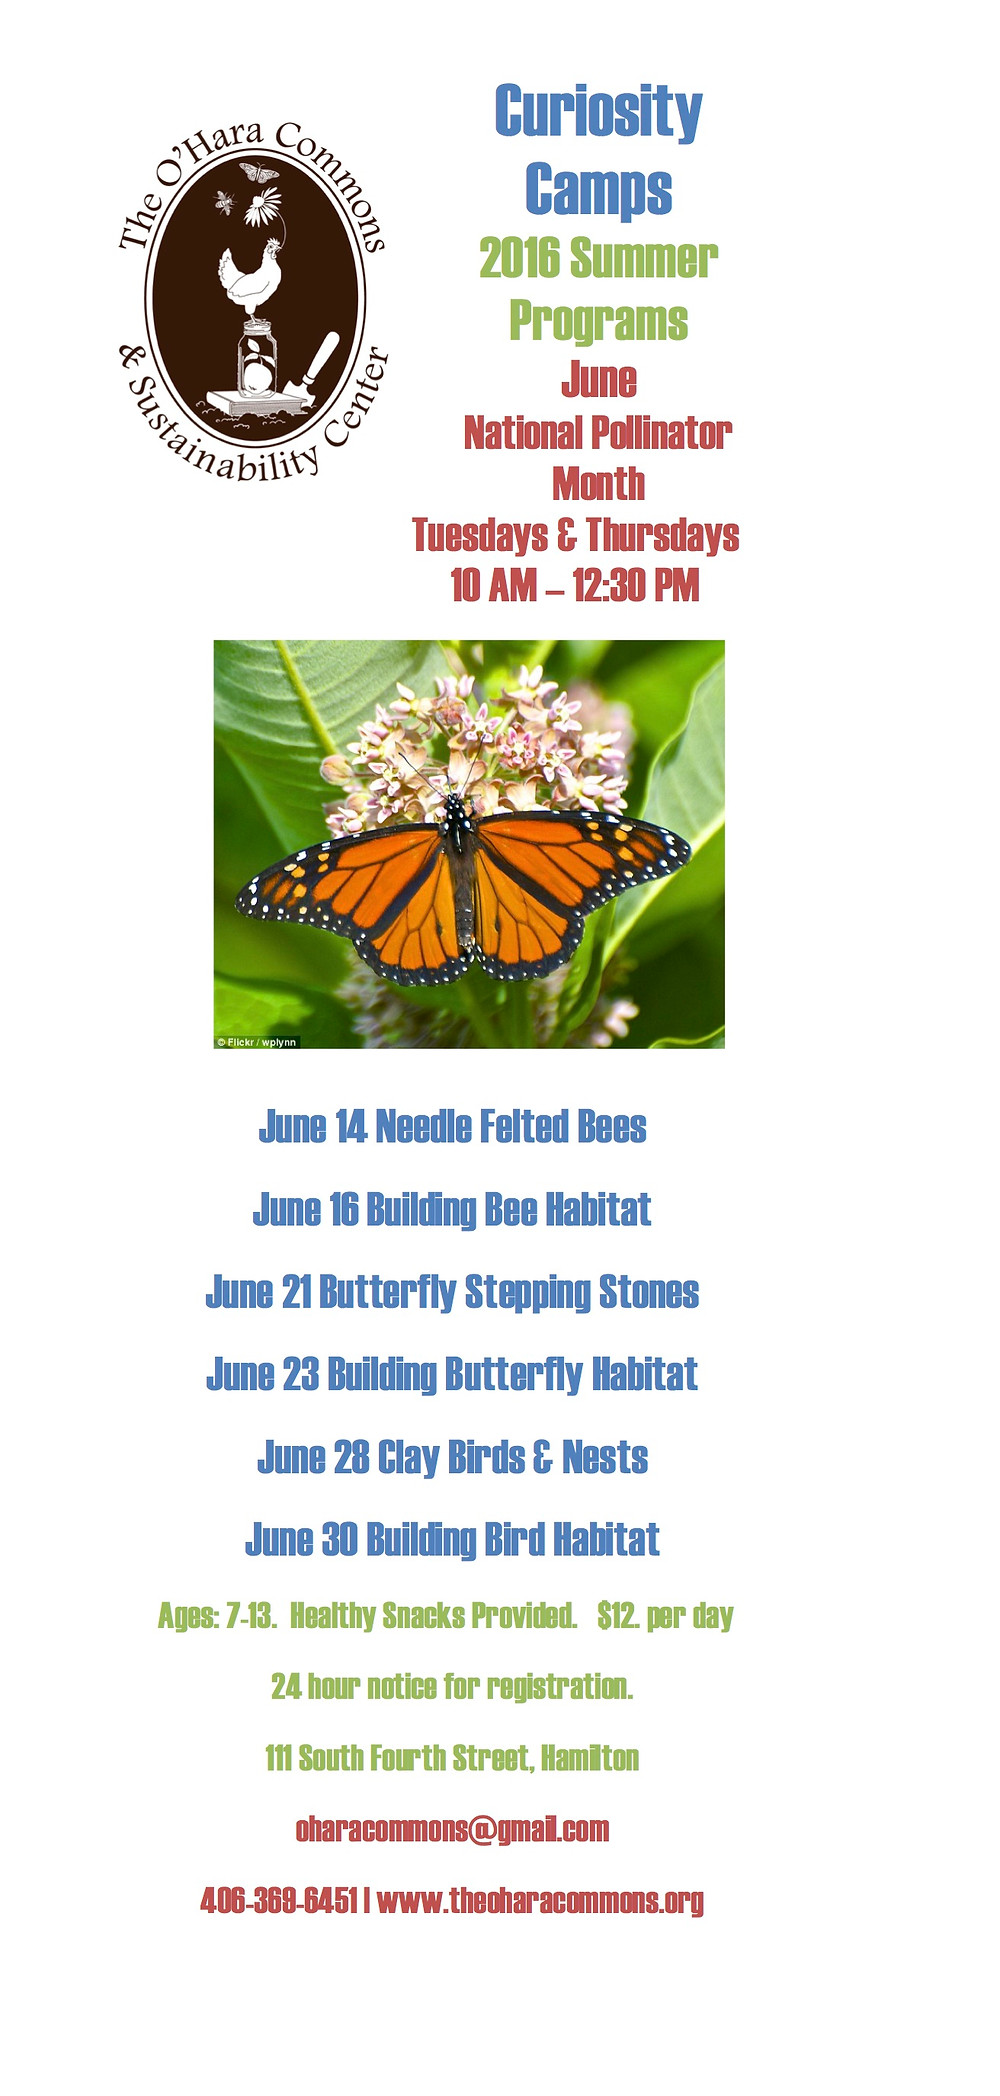 Curiosity Camps Schedule